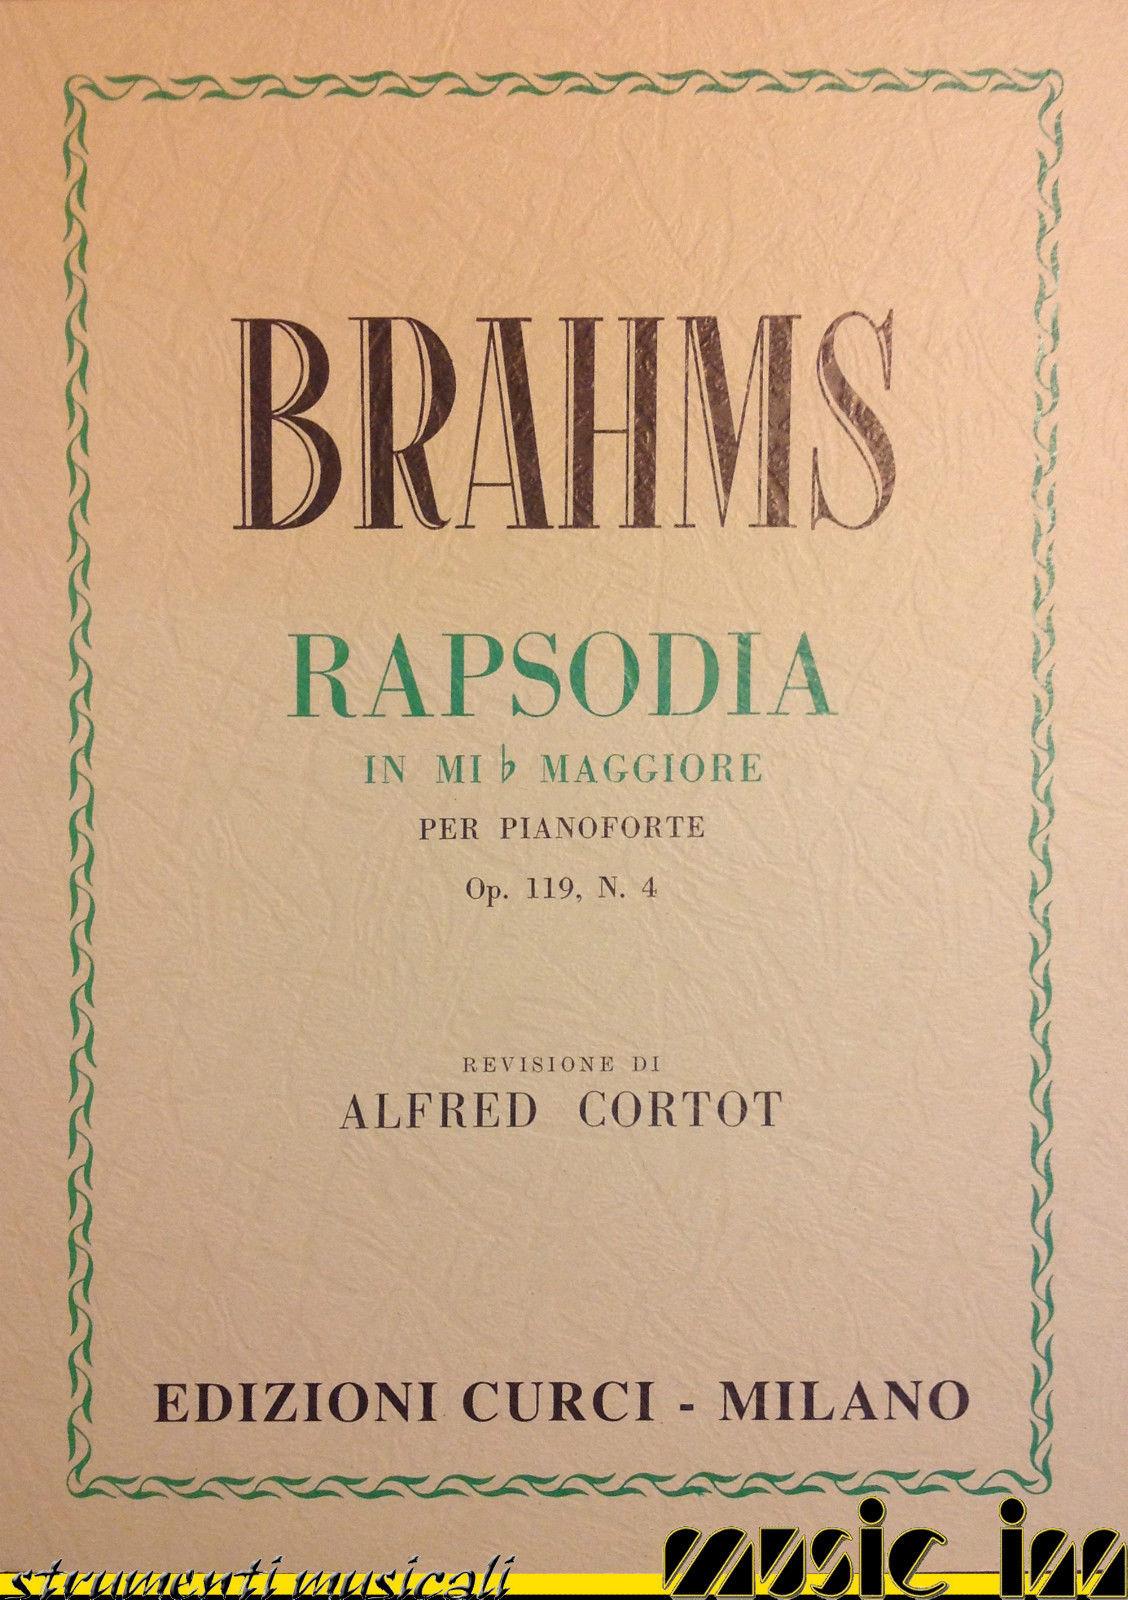 CURCI Rapsodia in Mib maggiore per pianoforte op. 119 n. 4 - BRAHMS